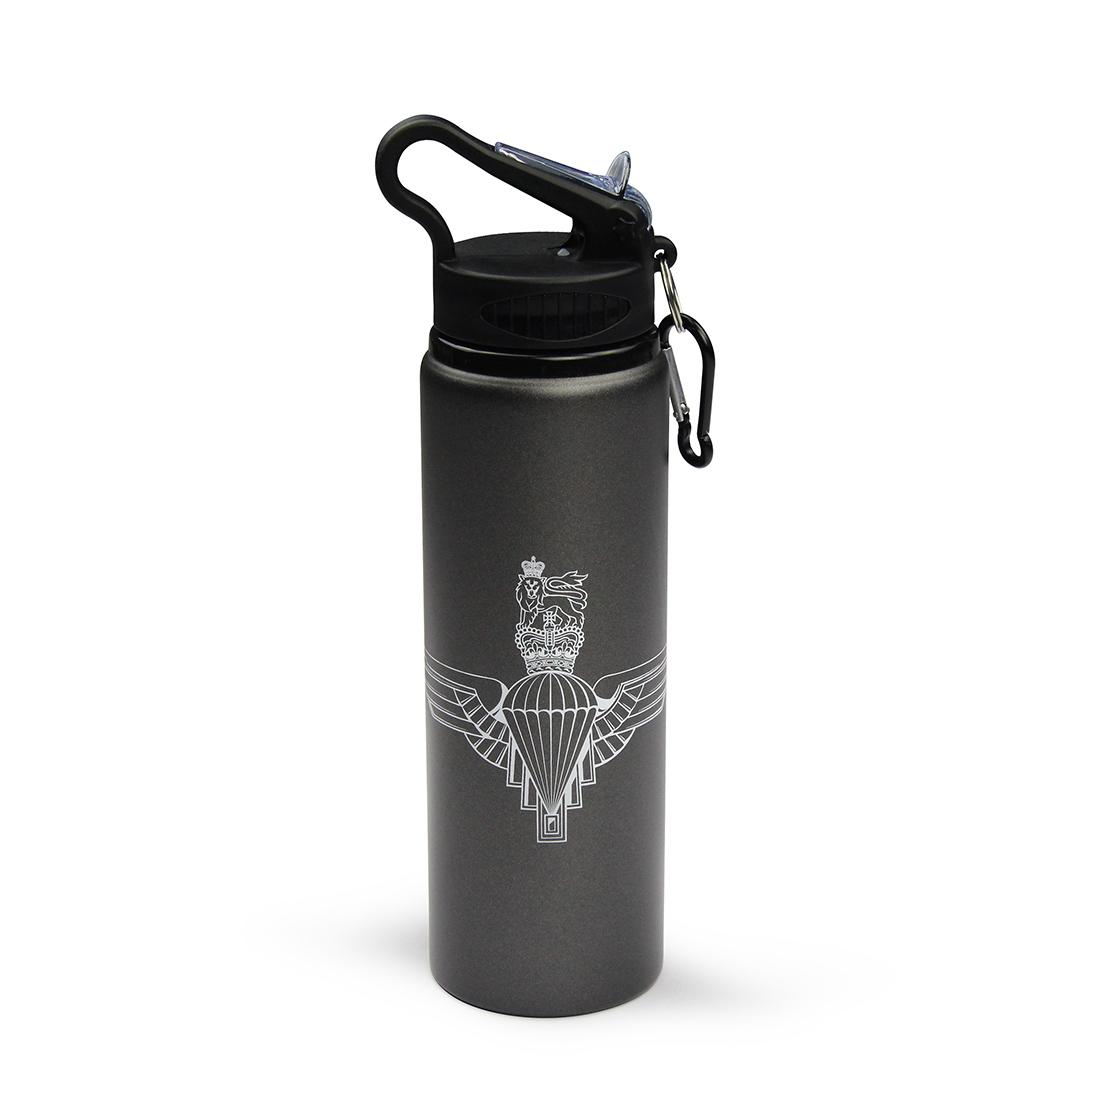 Aluminium Drinks Bottle (800ml) - Parachute Regiment